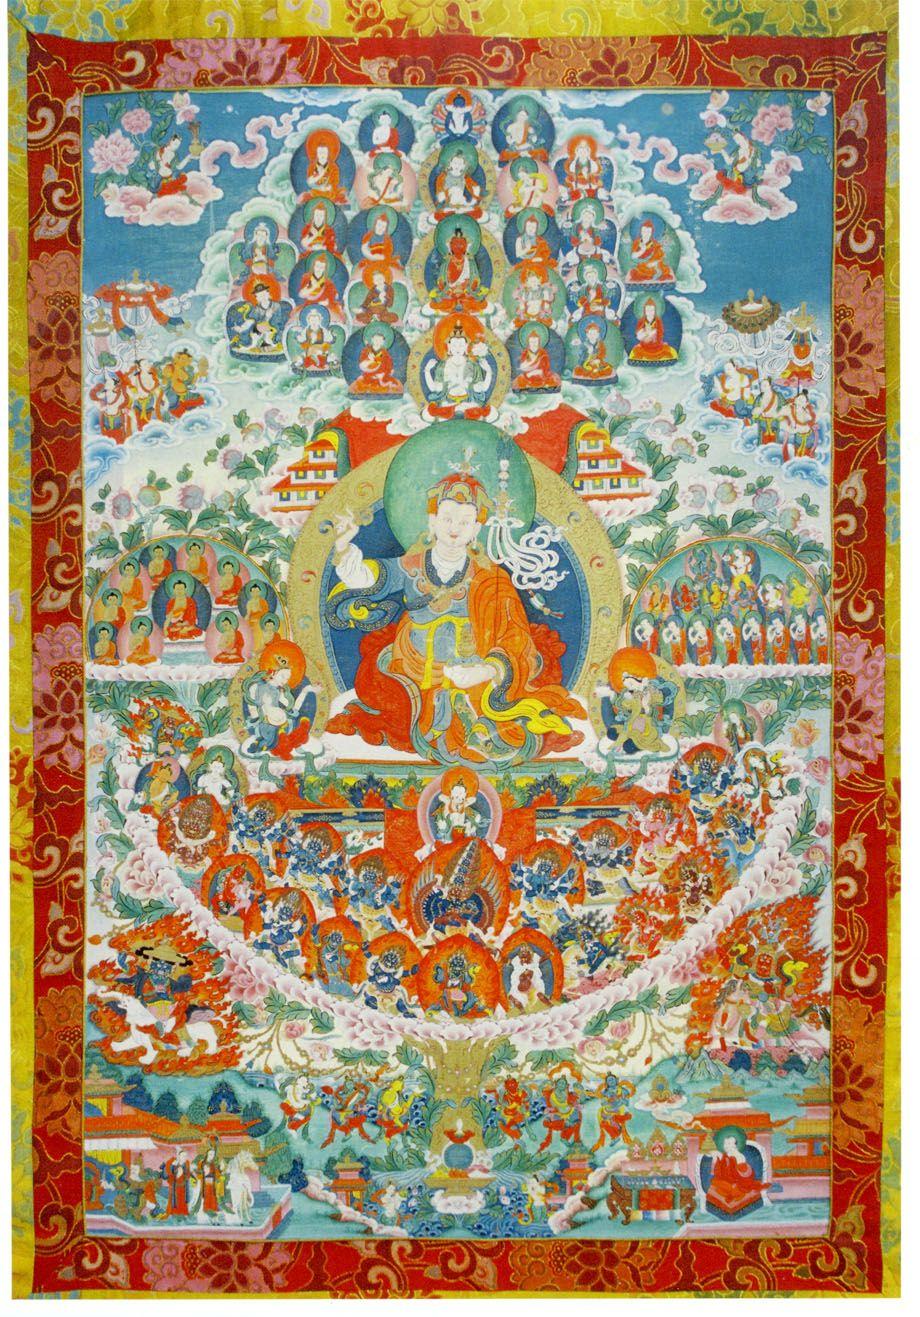 Guru Rinpoche lineage | Masters in 2019 | Tibetan buddhism